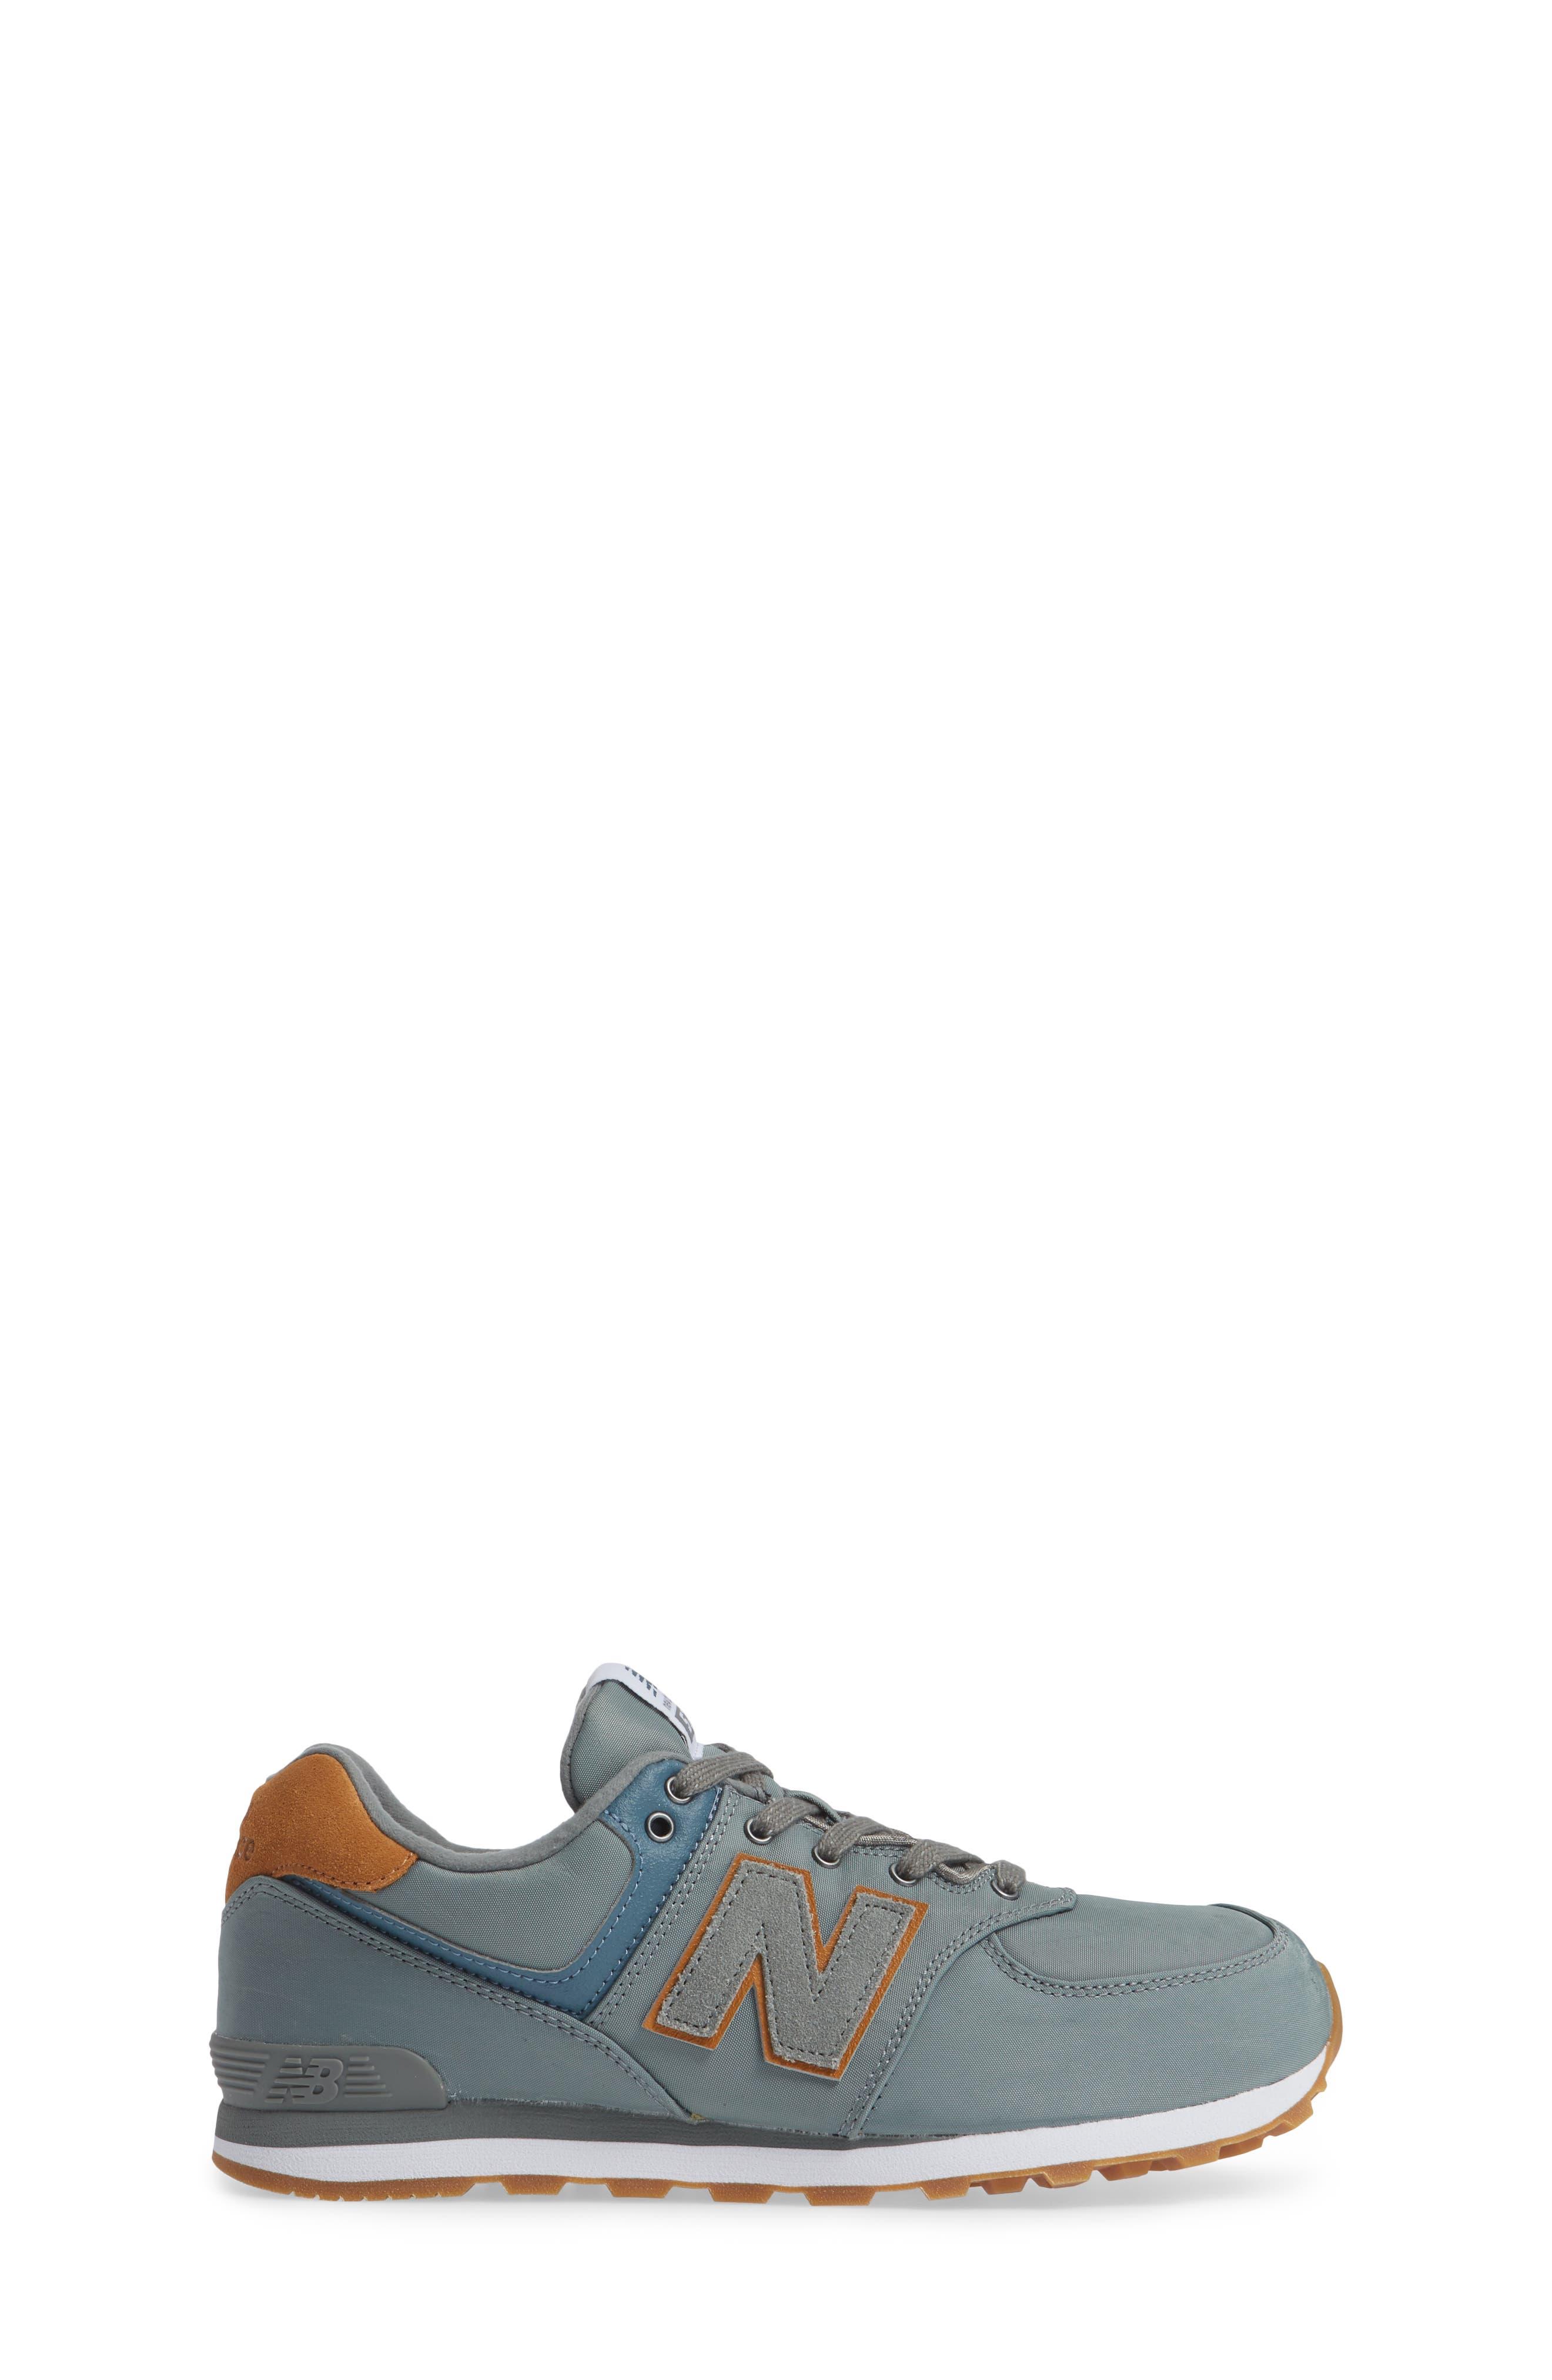 574 Essentials Sneaker,                             Alternate thumbnail 3, color,                             Sedona Sage